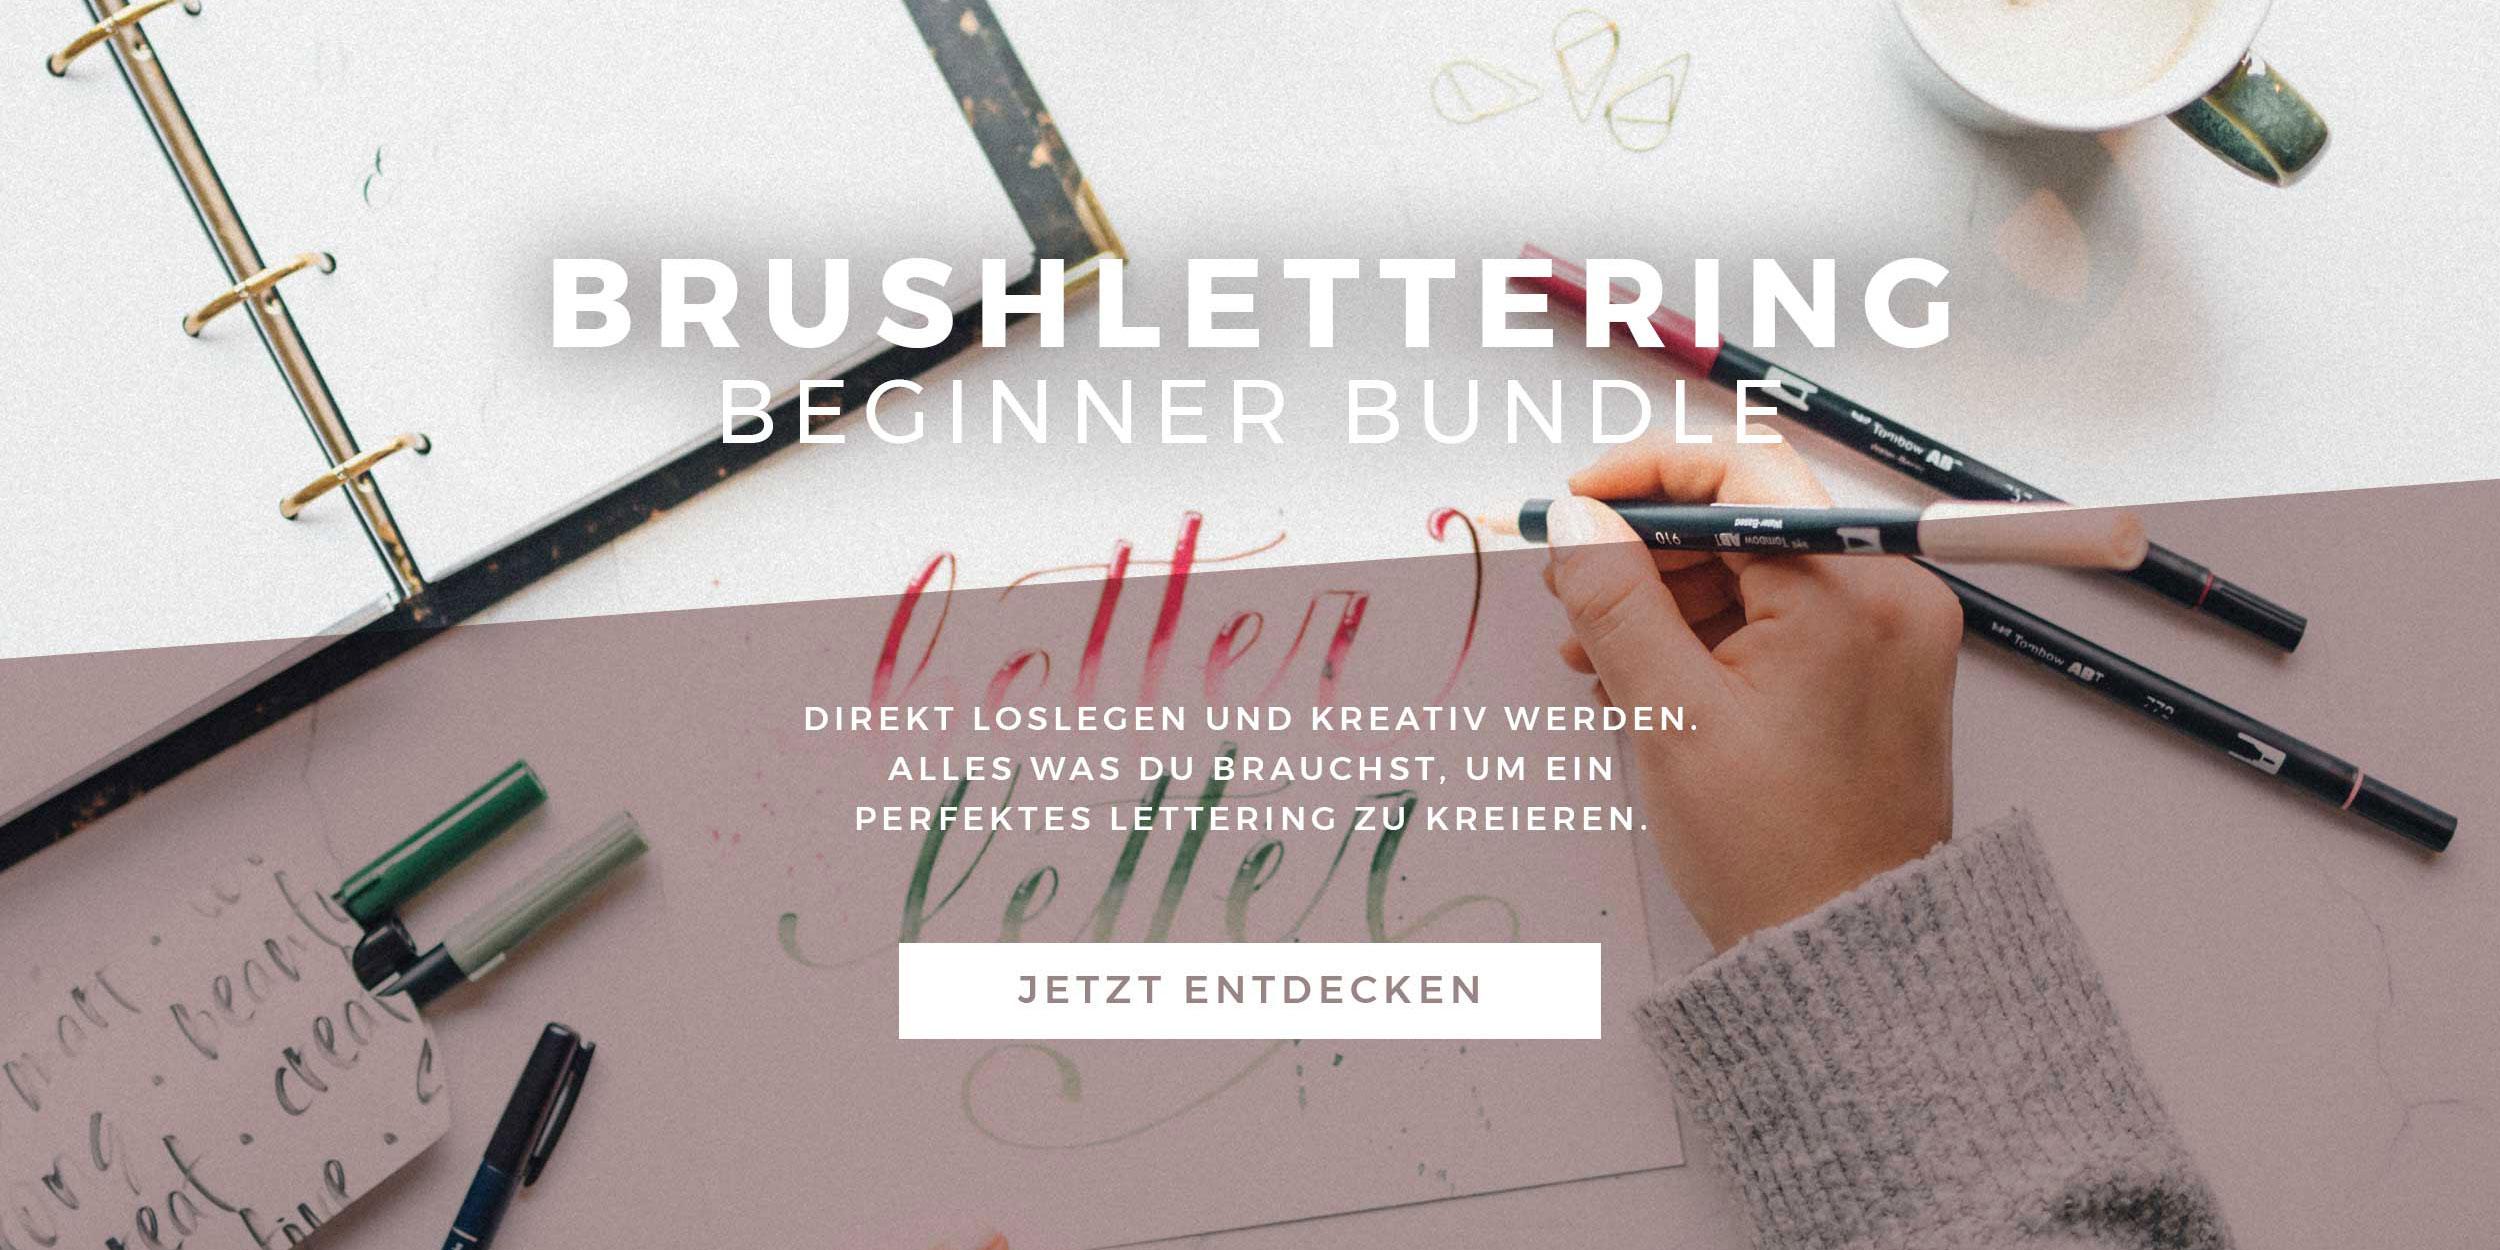 Brushlettering Beginner Bundle Slider mit Button